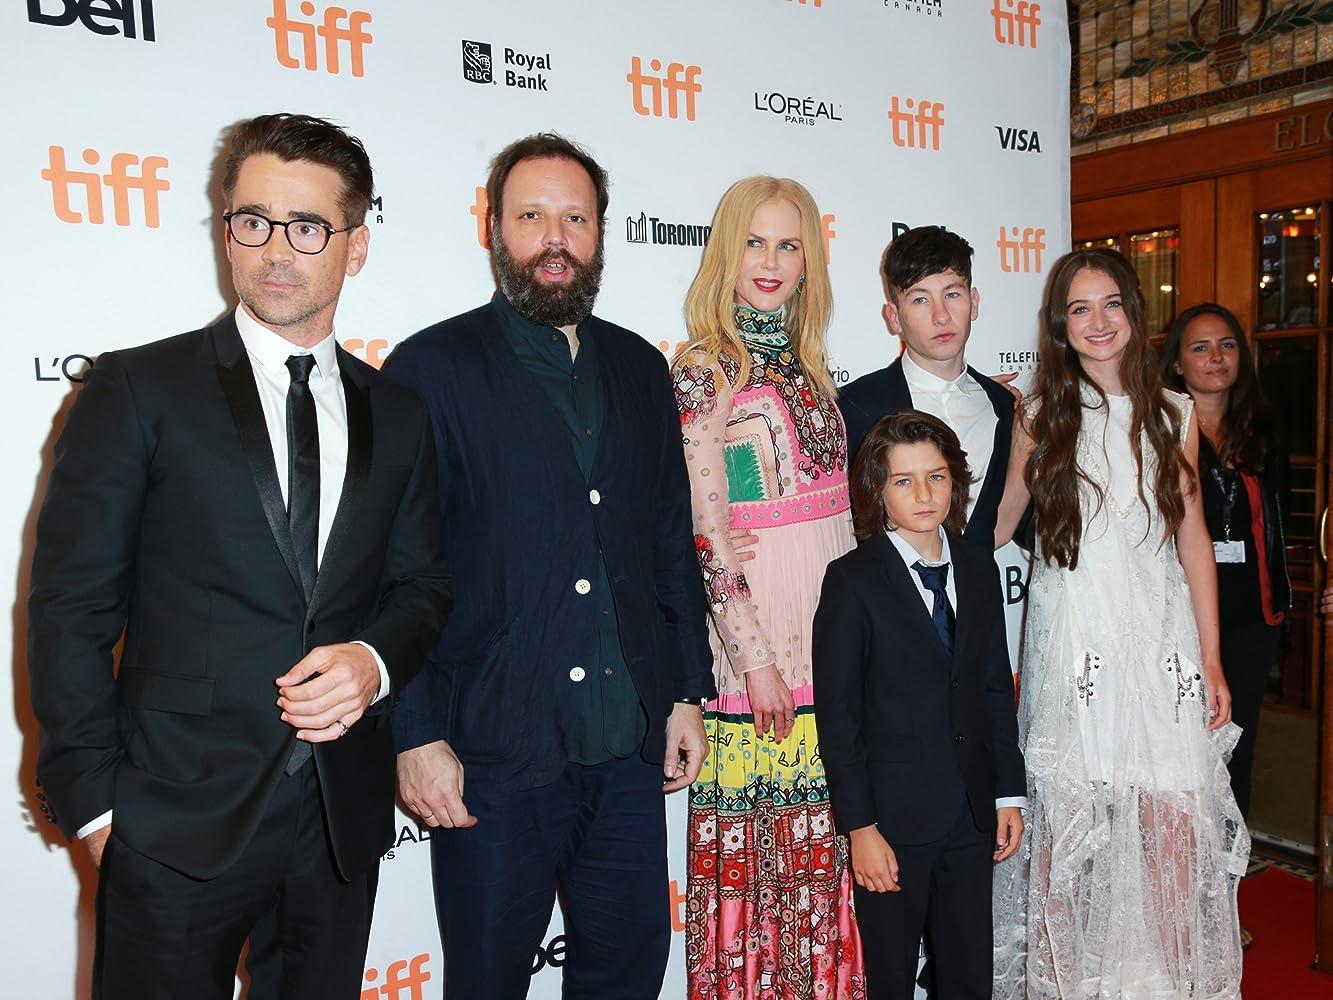 Nicole Kidman, Colin Farrell, Yorgos Lanthimos, Raffey Cassidy, Barry Keoghan, and Sunny Suljic